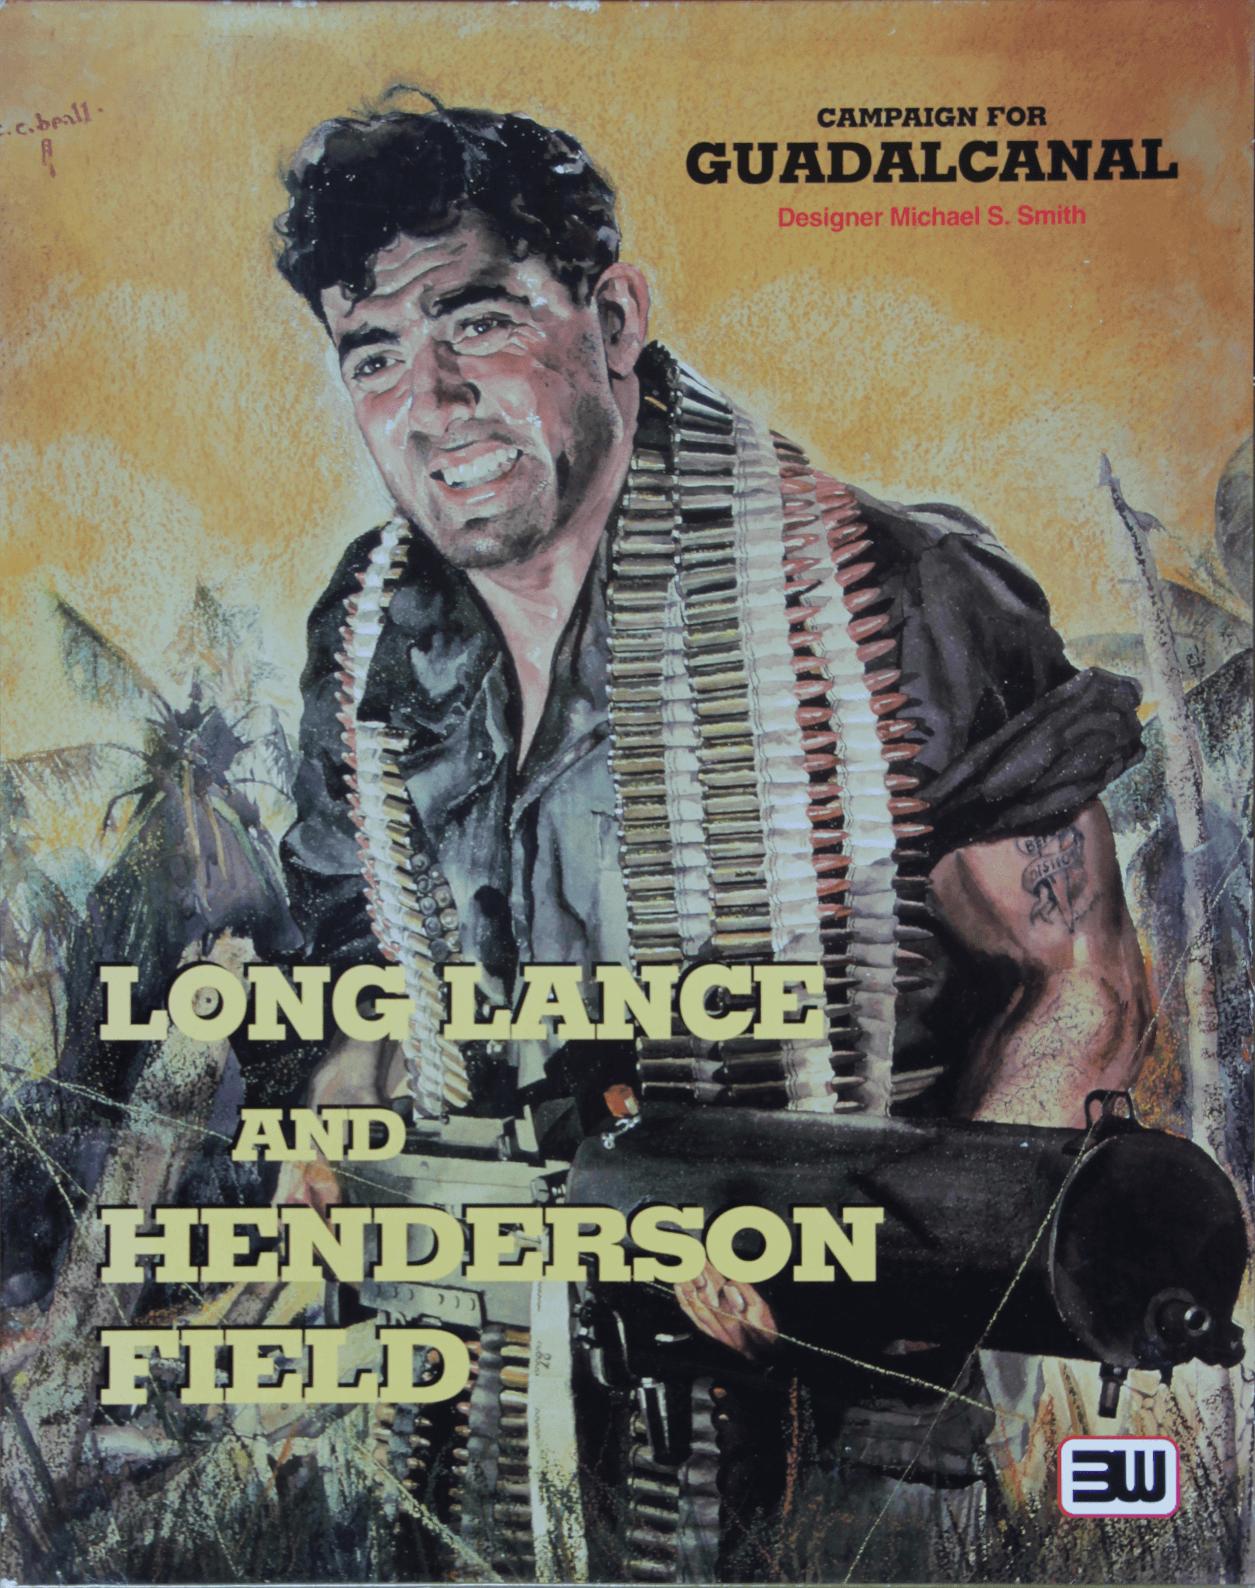 настольная игра Campaign for Guadalcanal: Long Lance & Henderson Field Кампания за Гуадалканал: Длинное копье и Хендерсон-Филд